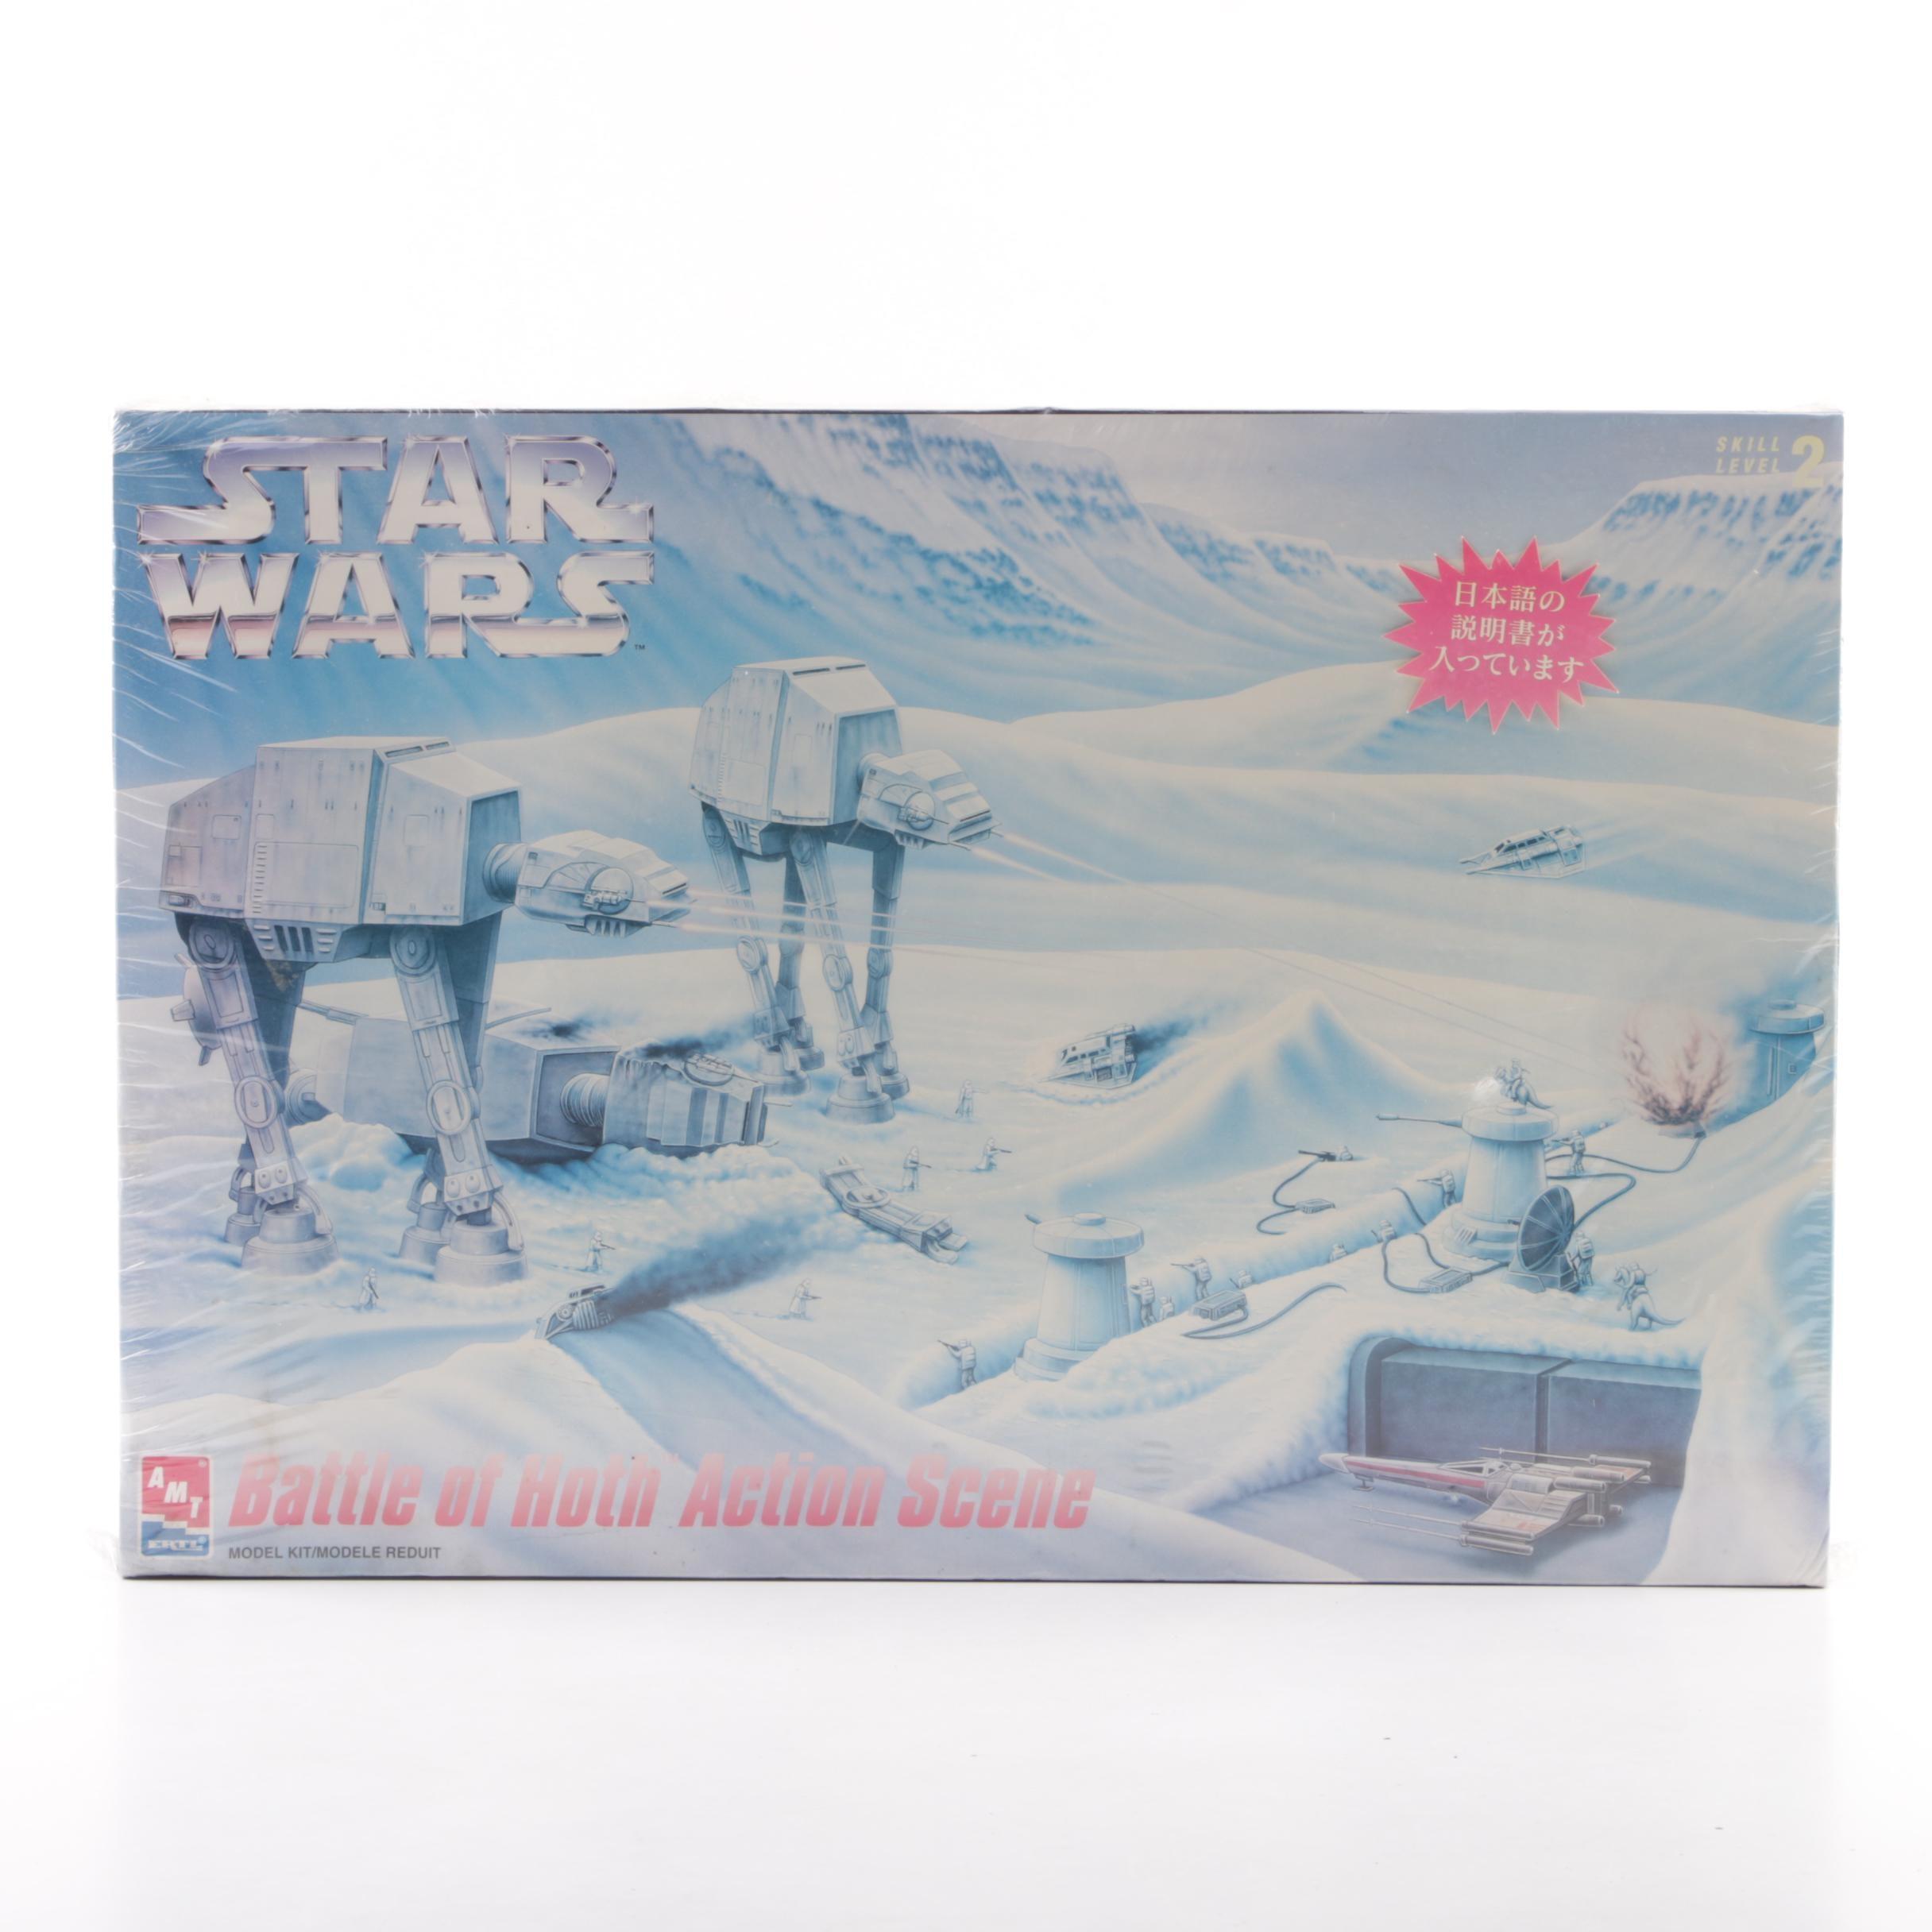 "1990s AMT Ertl ""Star Wars"" Battle of Hoth Action Scene Model Kit"